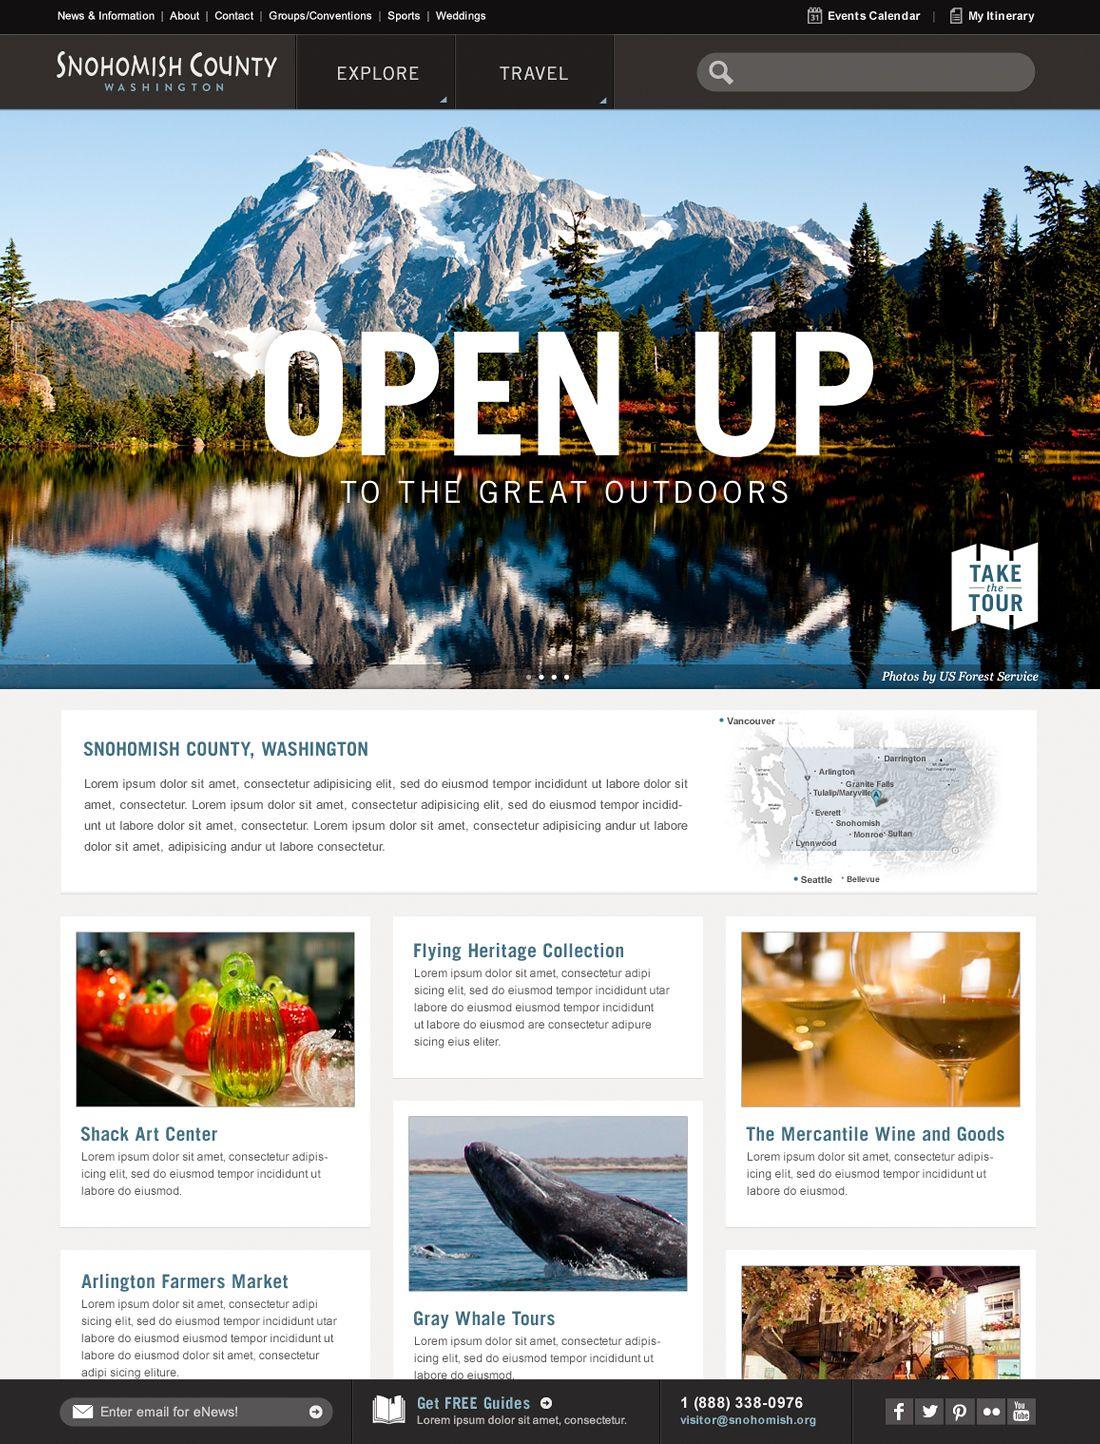 Web snohomish county homepage design showcase design